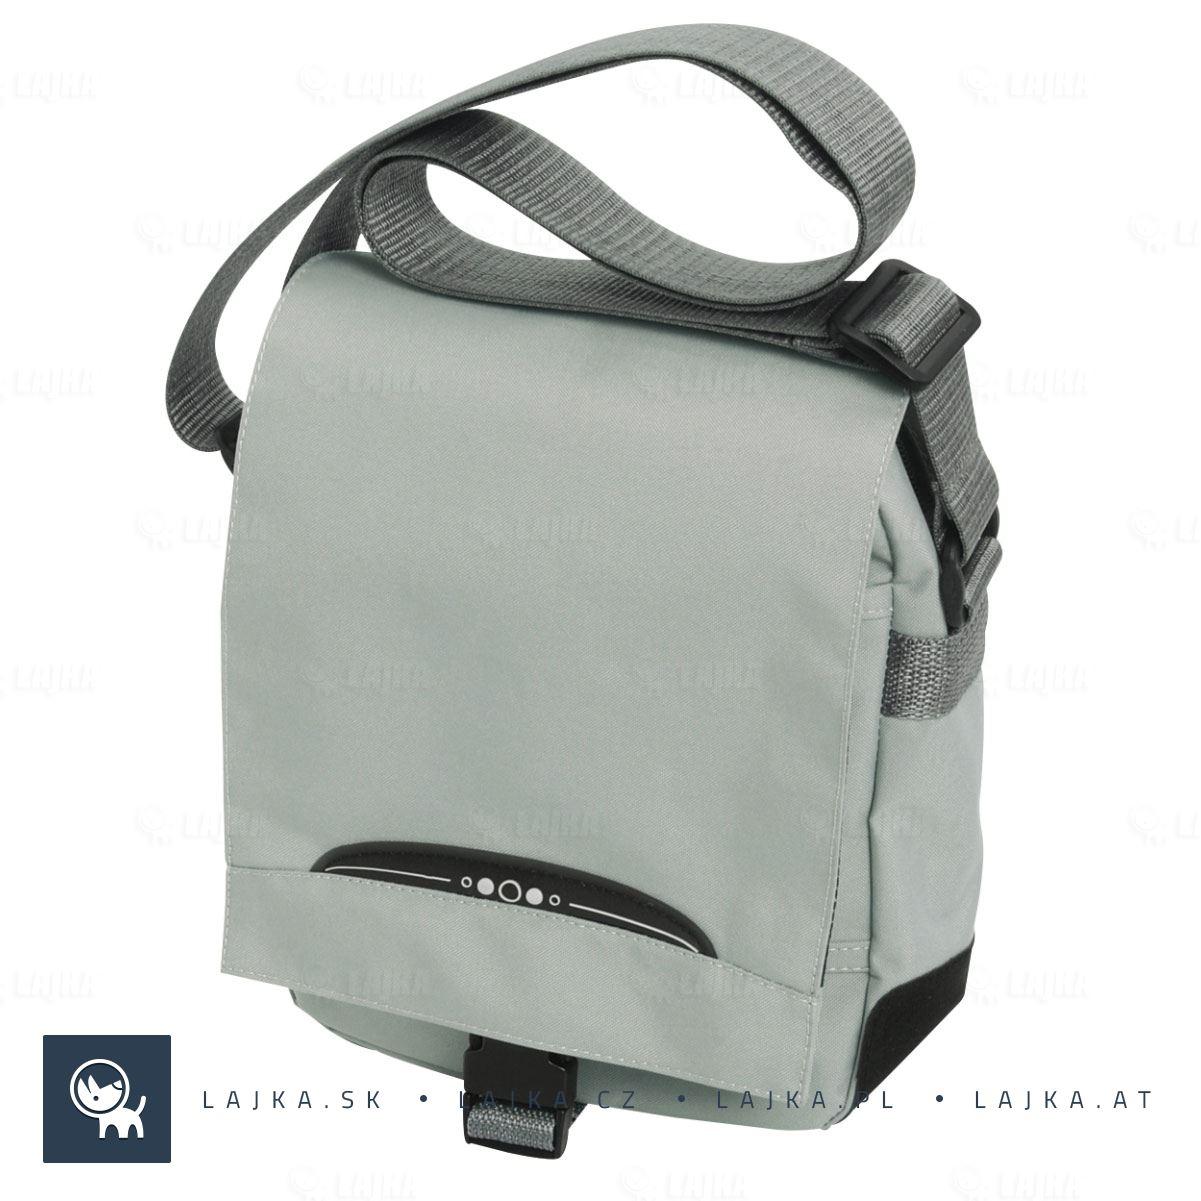 0b3b72a06 Malá taška Tess, sivá | LAJKA®